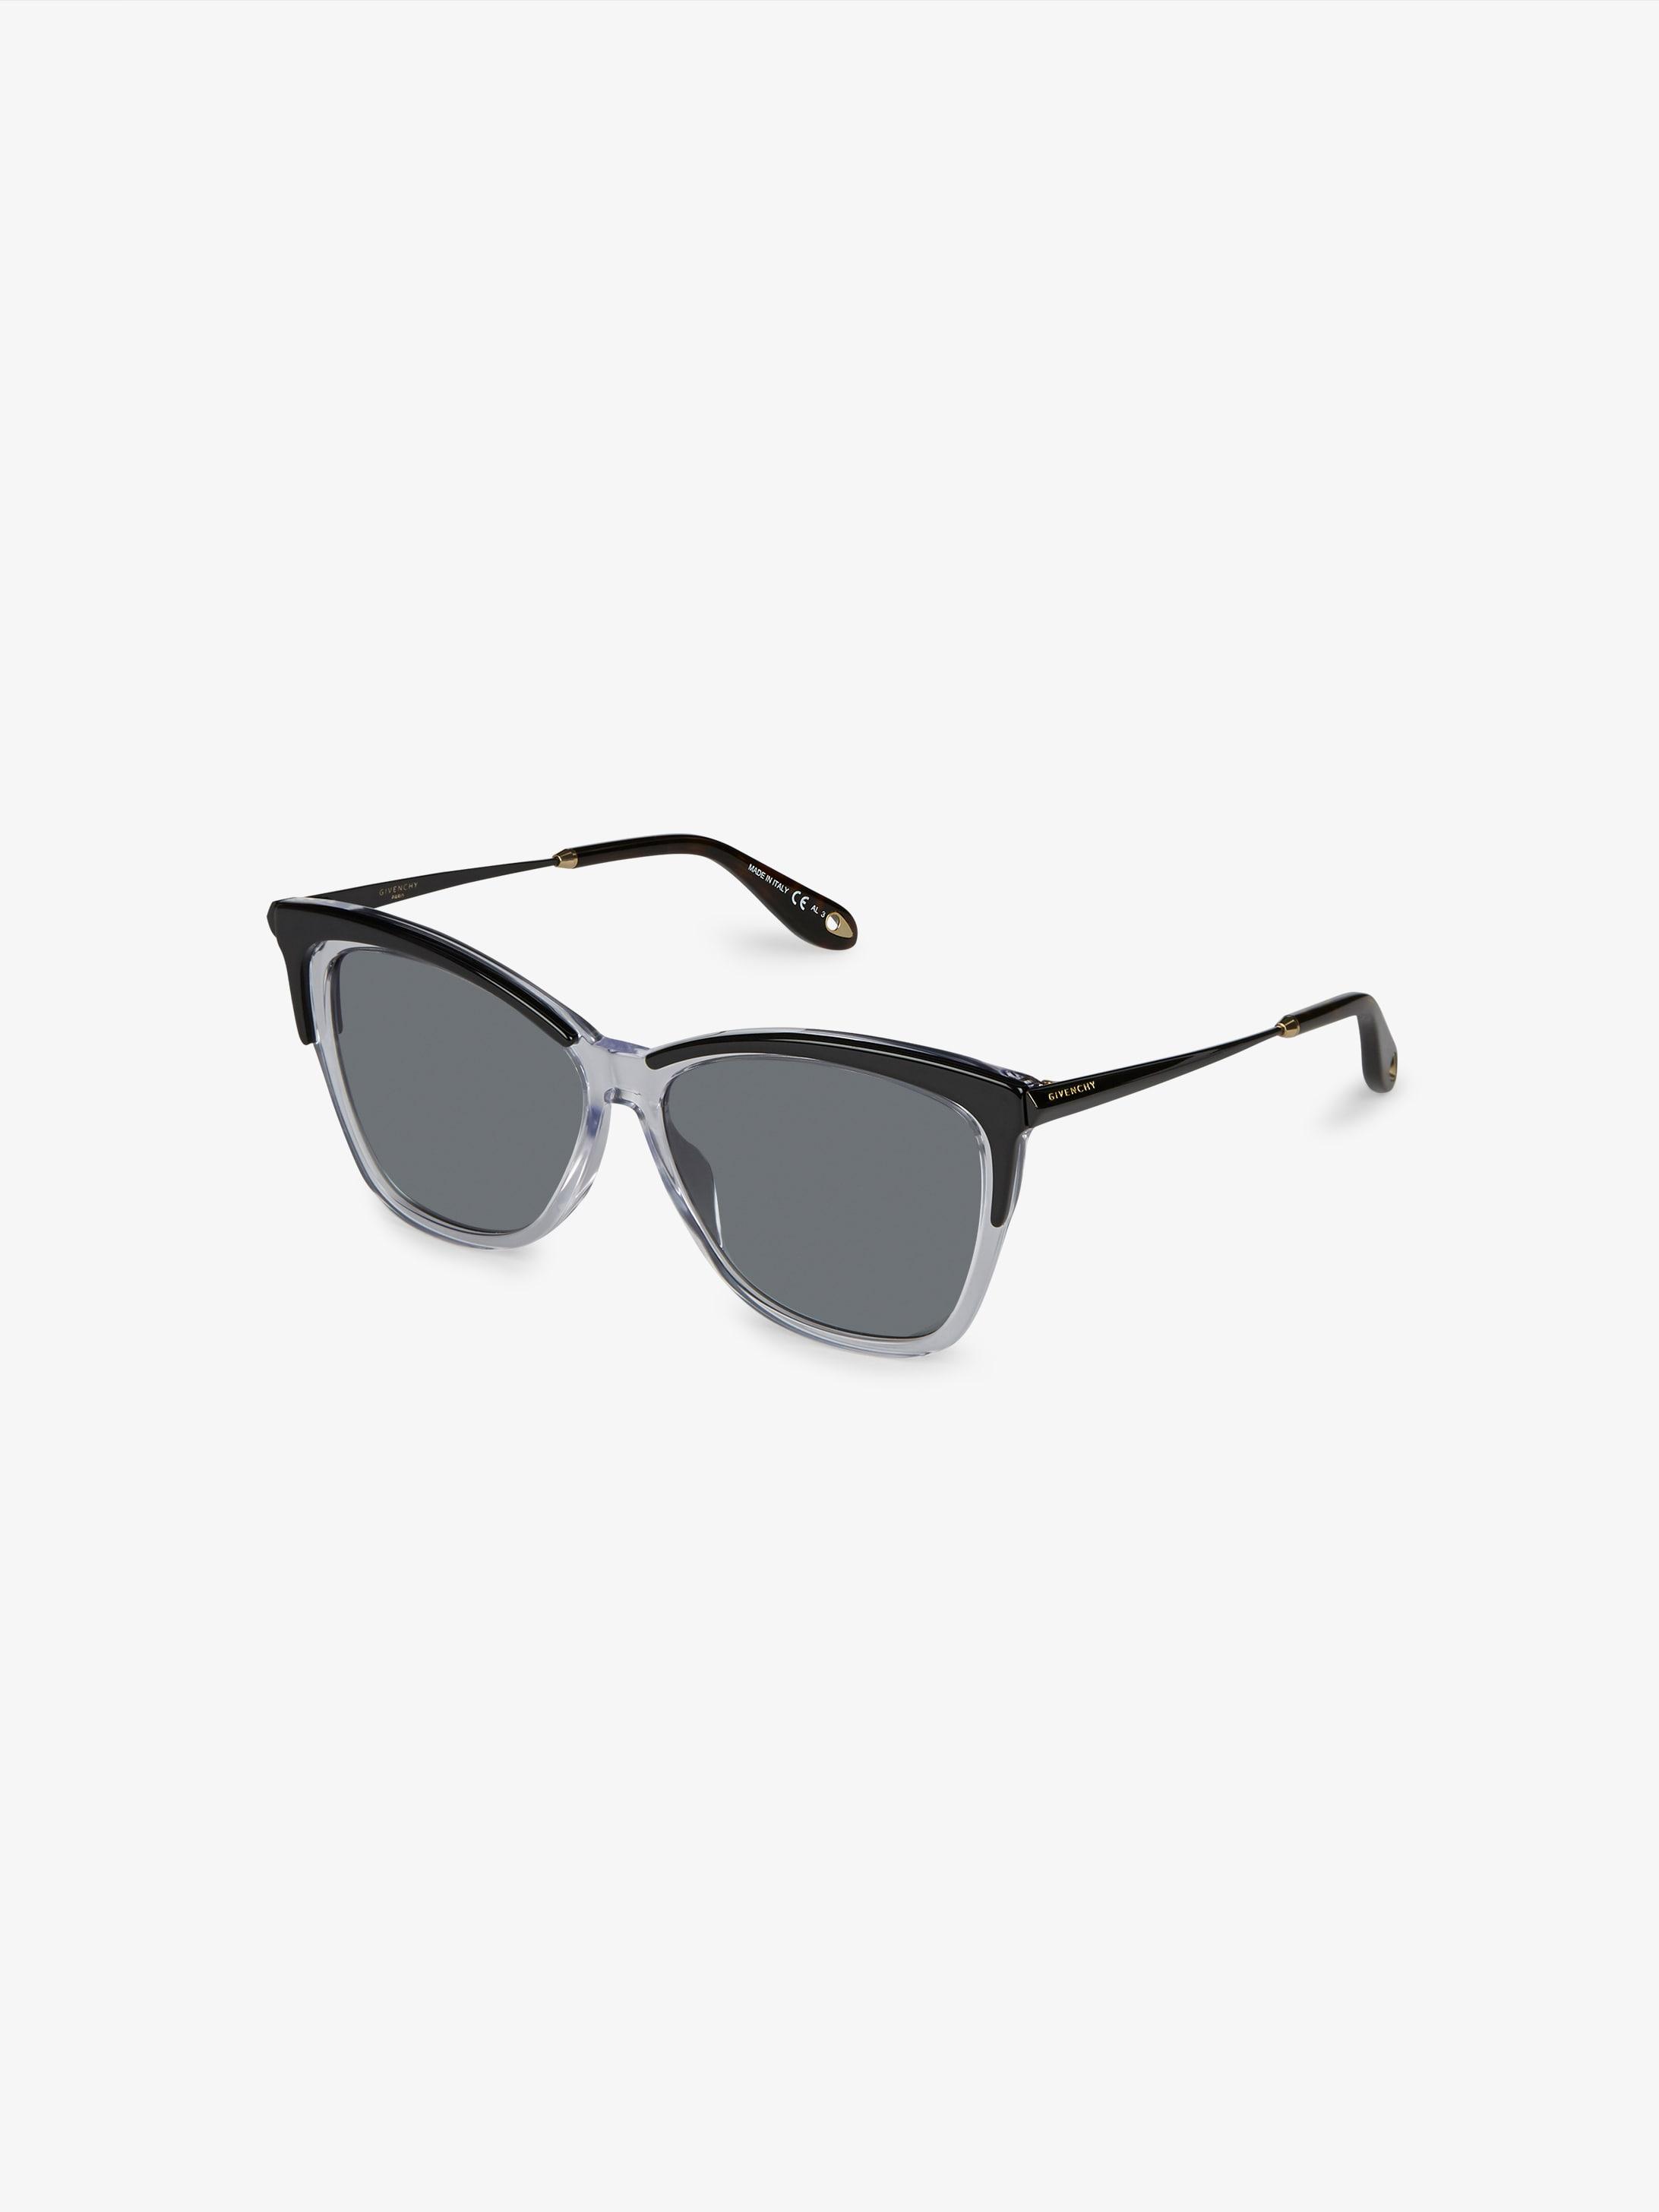 Acetate and metal sunglasses